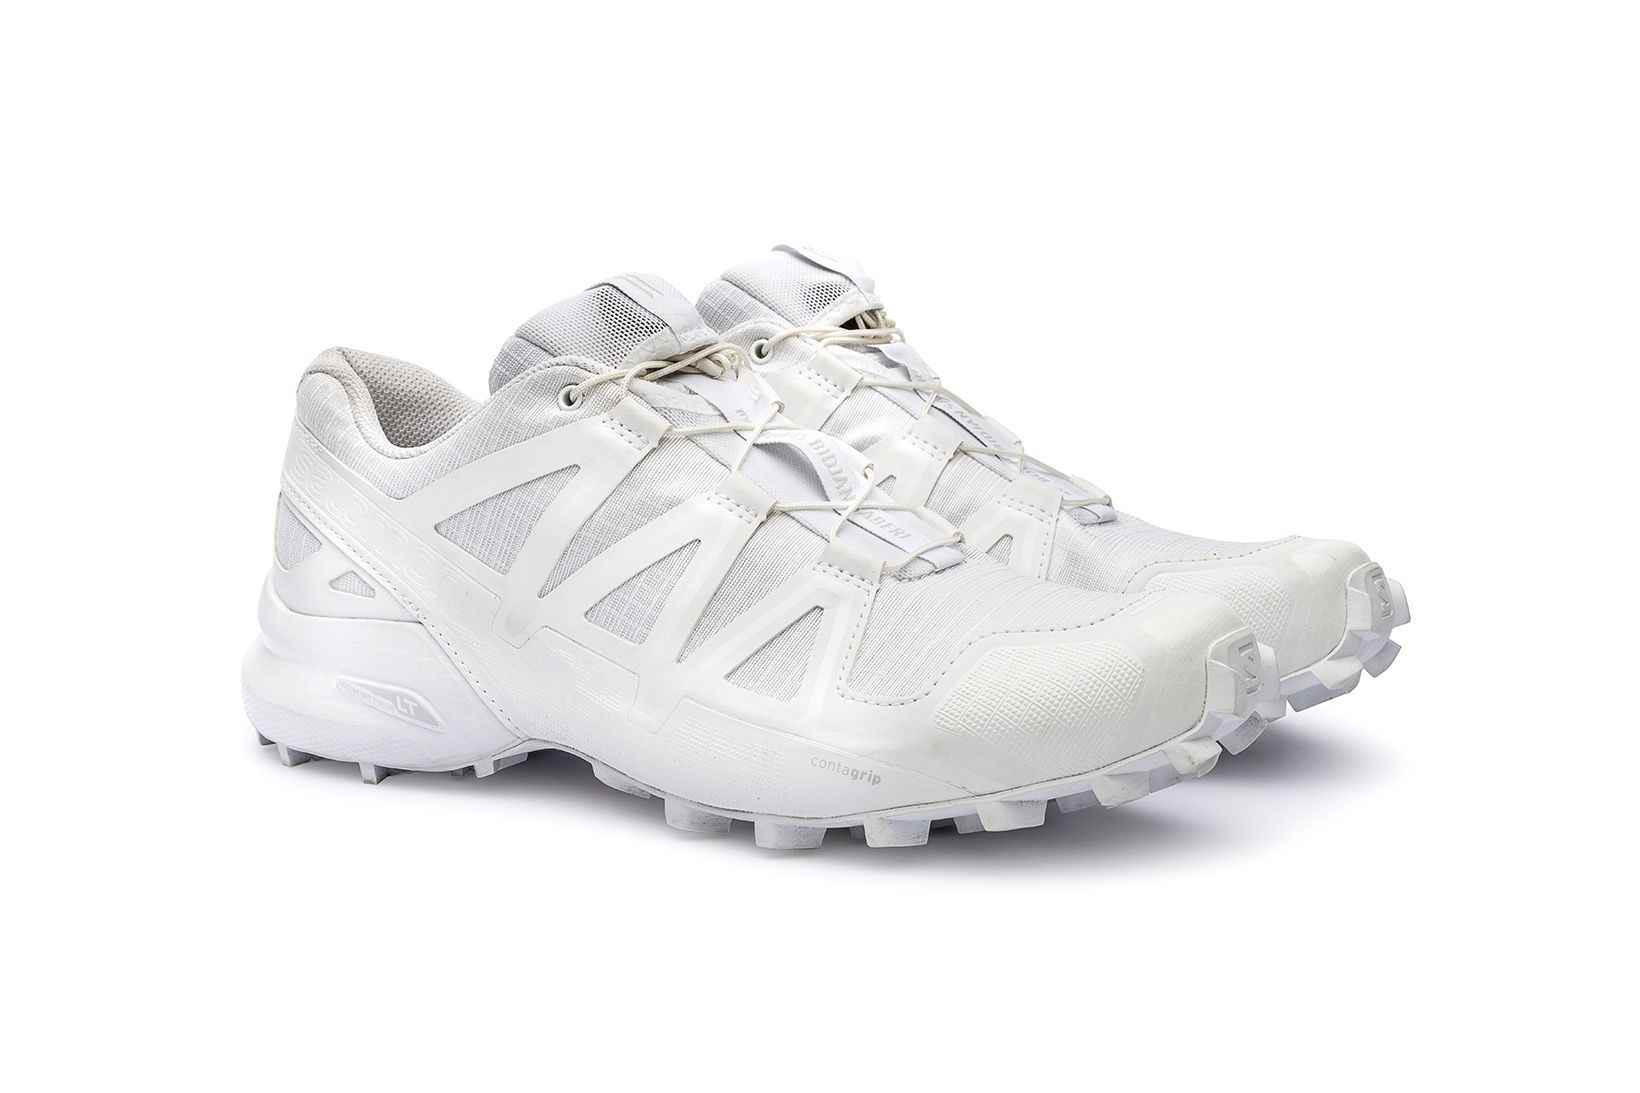 Salomon shoes, Footwear, Boris bidjan